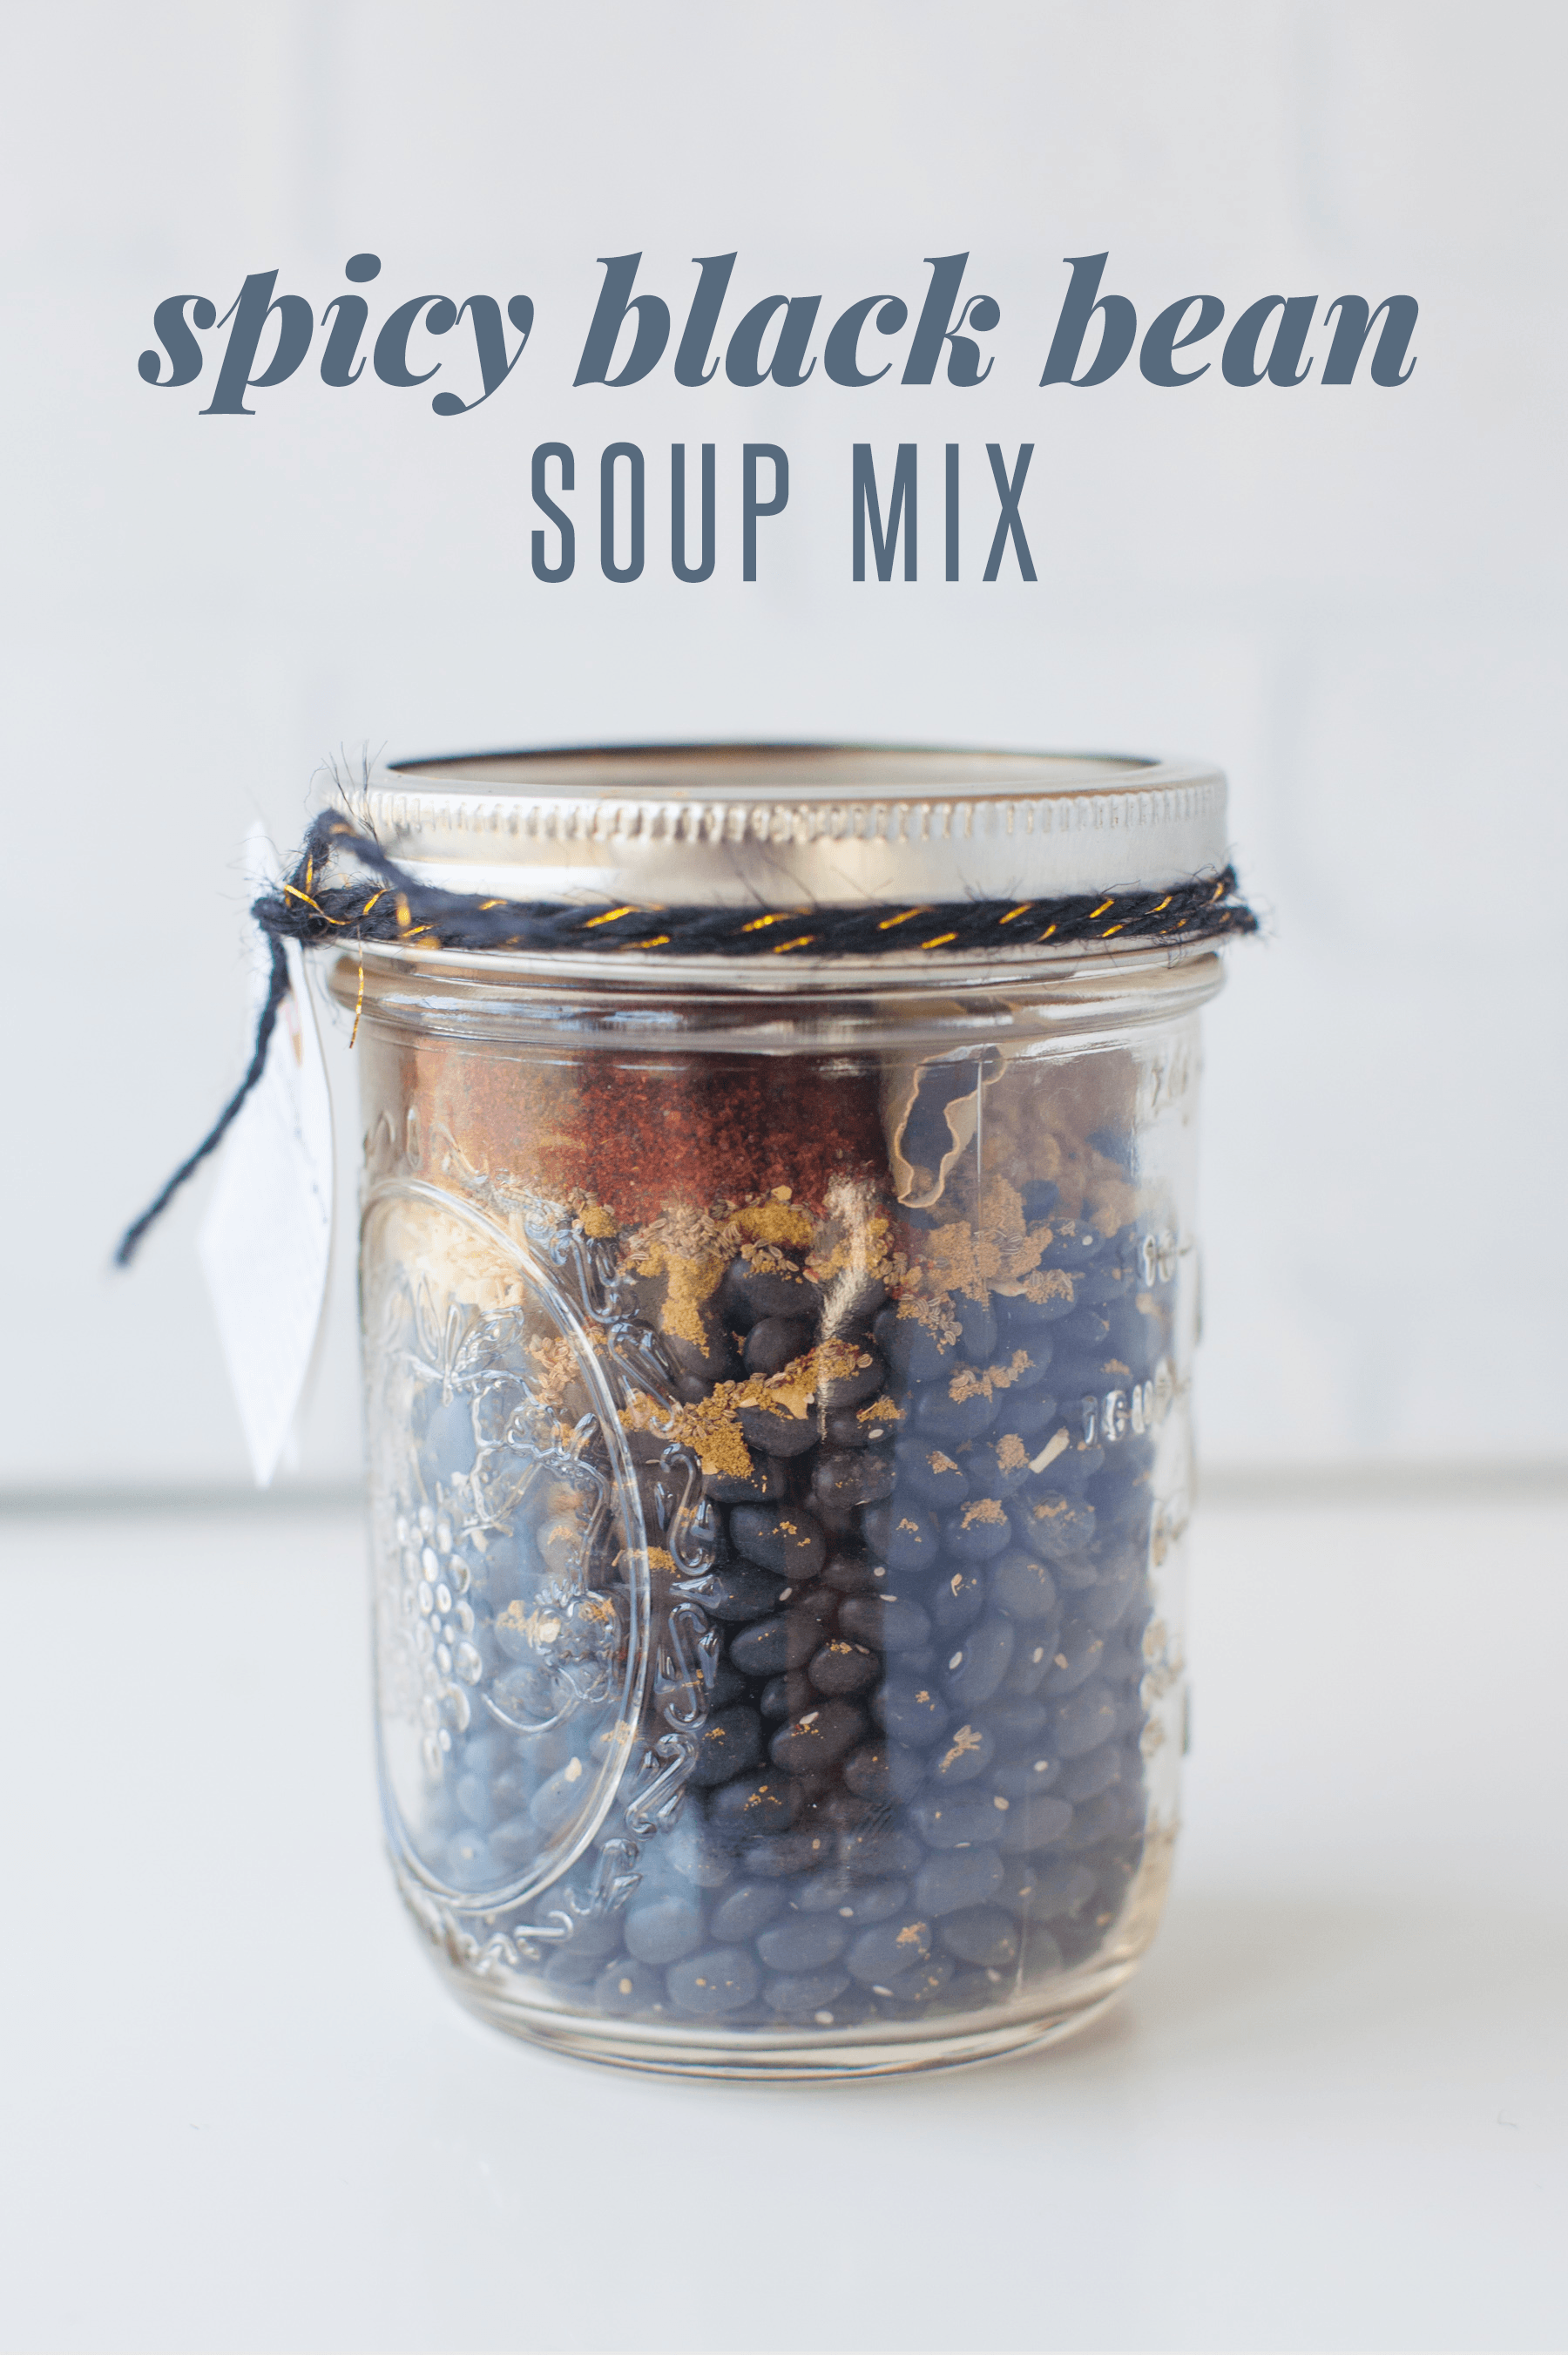 Spicy Black Bean Soup Mix